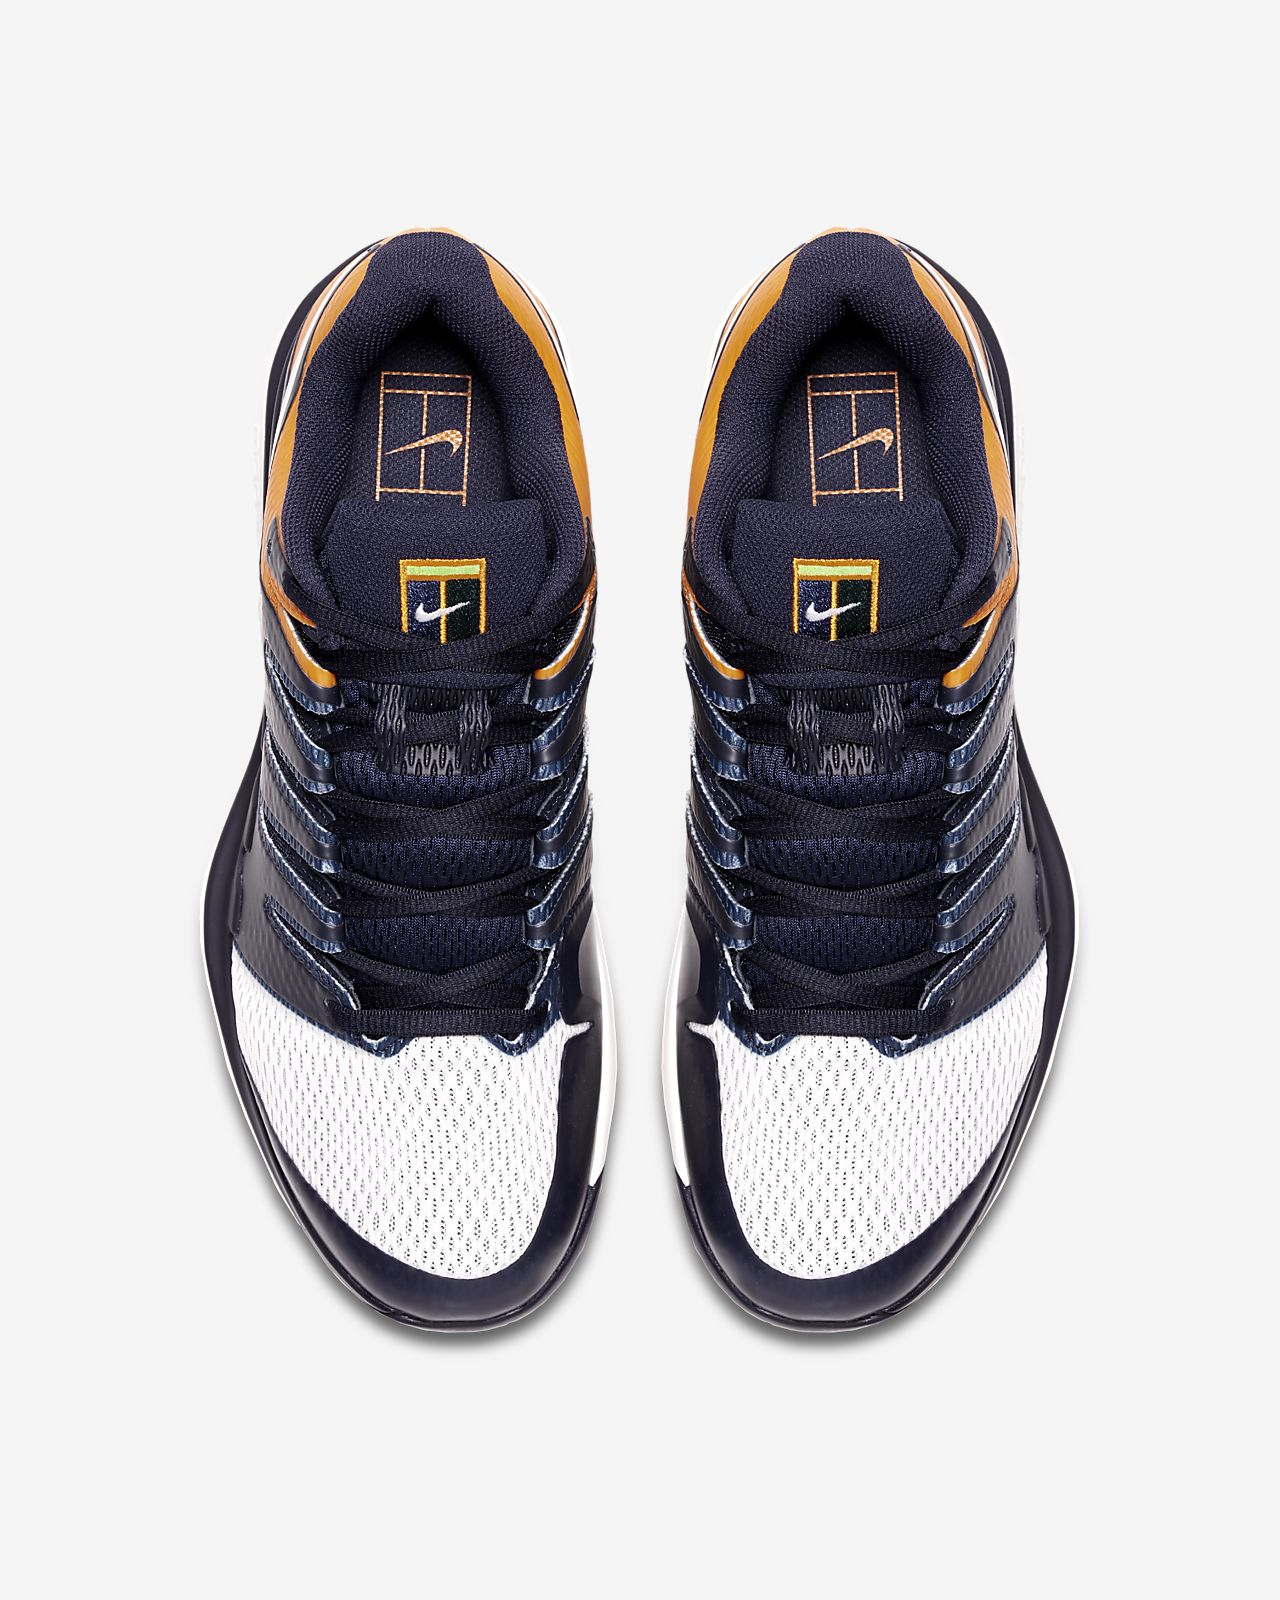 472203defa9a9 NikeCourt Air Zoom Vapor X Men s Hard Court Tennis Shoe. Nike.com GB